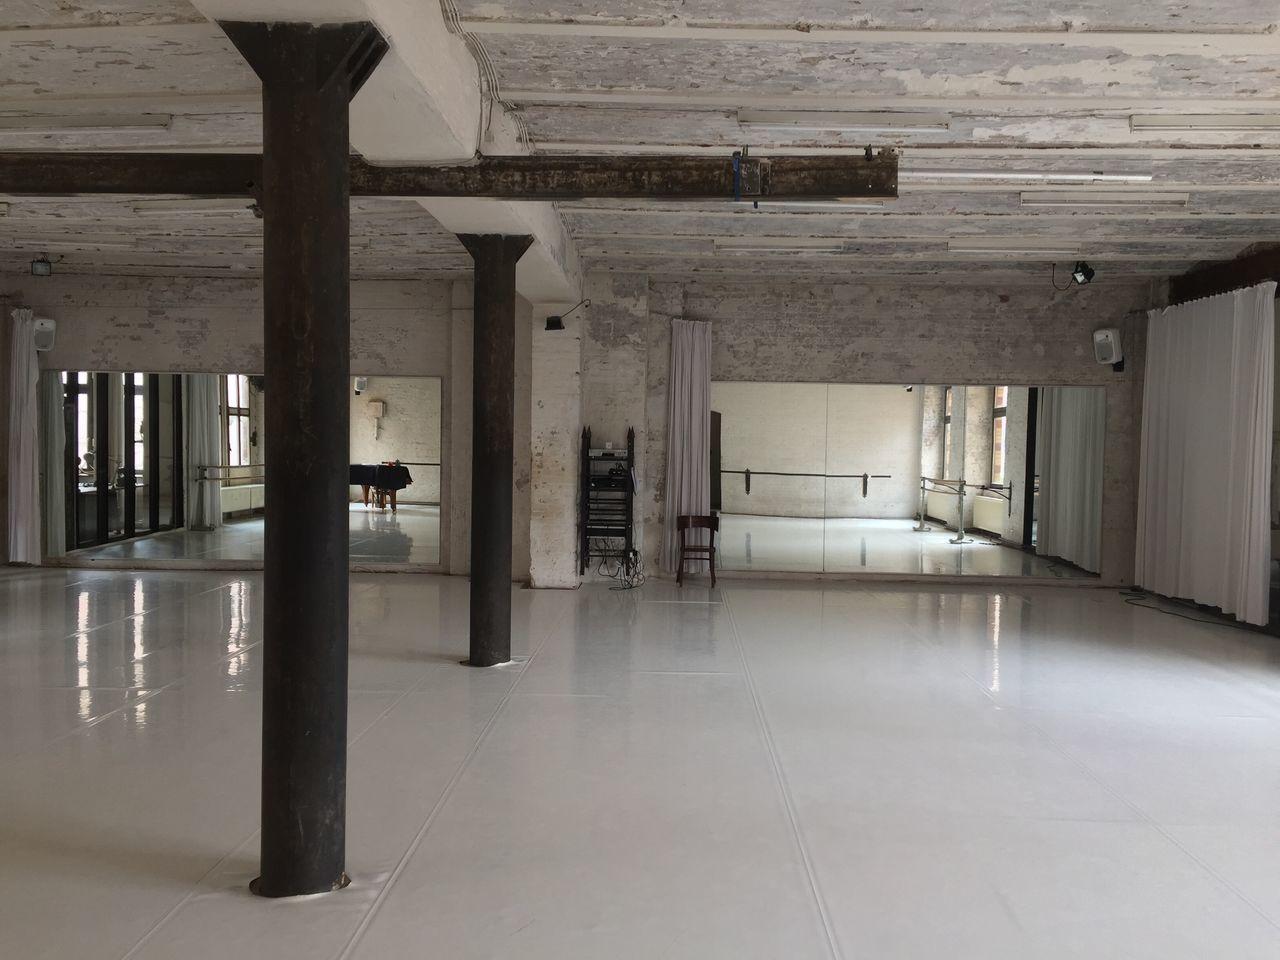 Doc11 Dance Studio Loft Indoors  Architecture Architectural Column No People Built Structure Day Berlin Dance